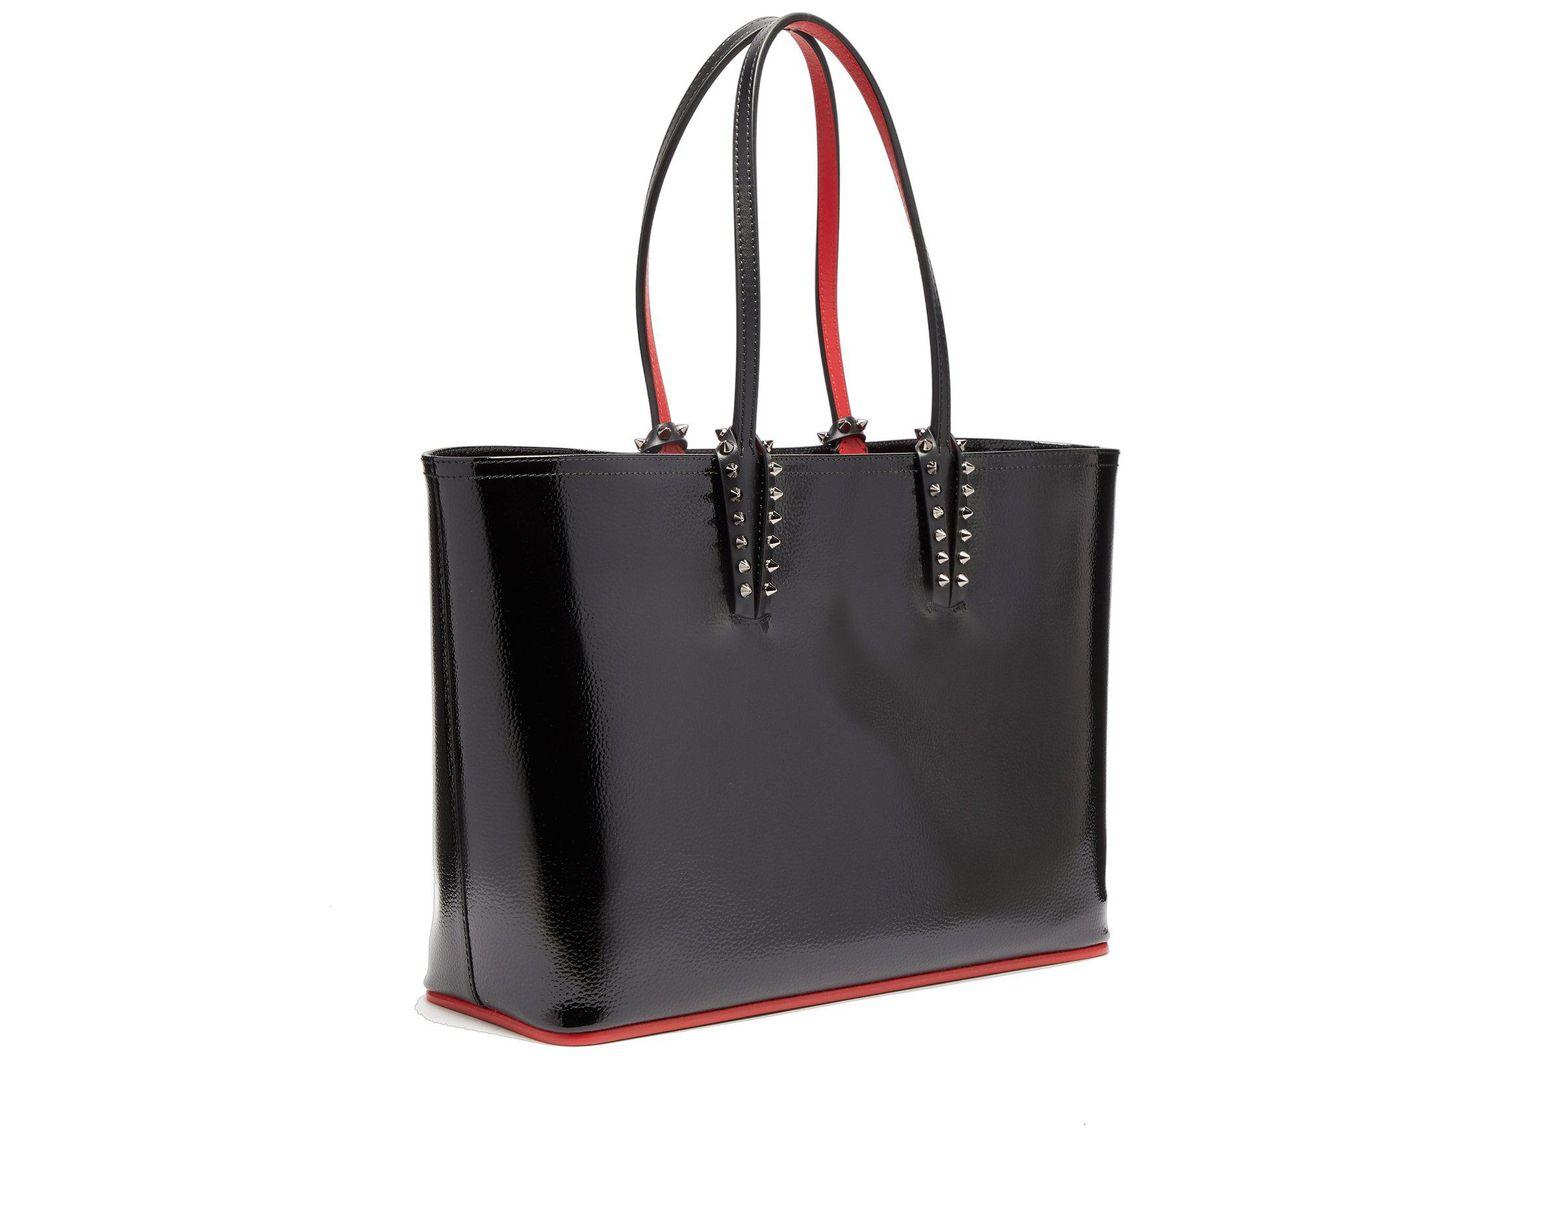 3b7cd36586e Women's Black Cabata Patent Leather Tote